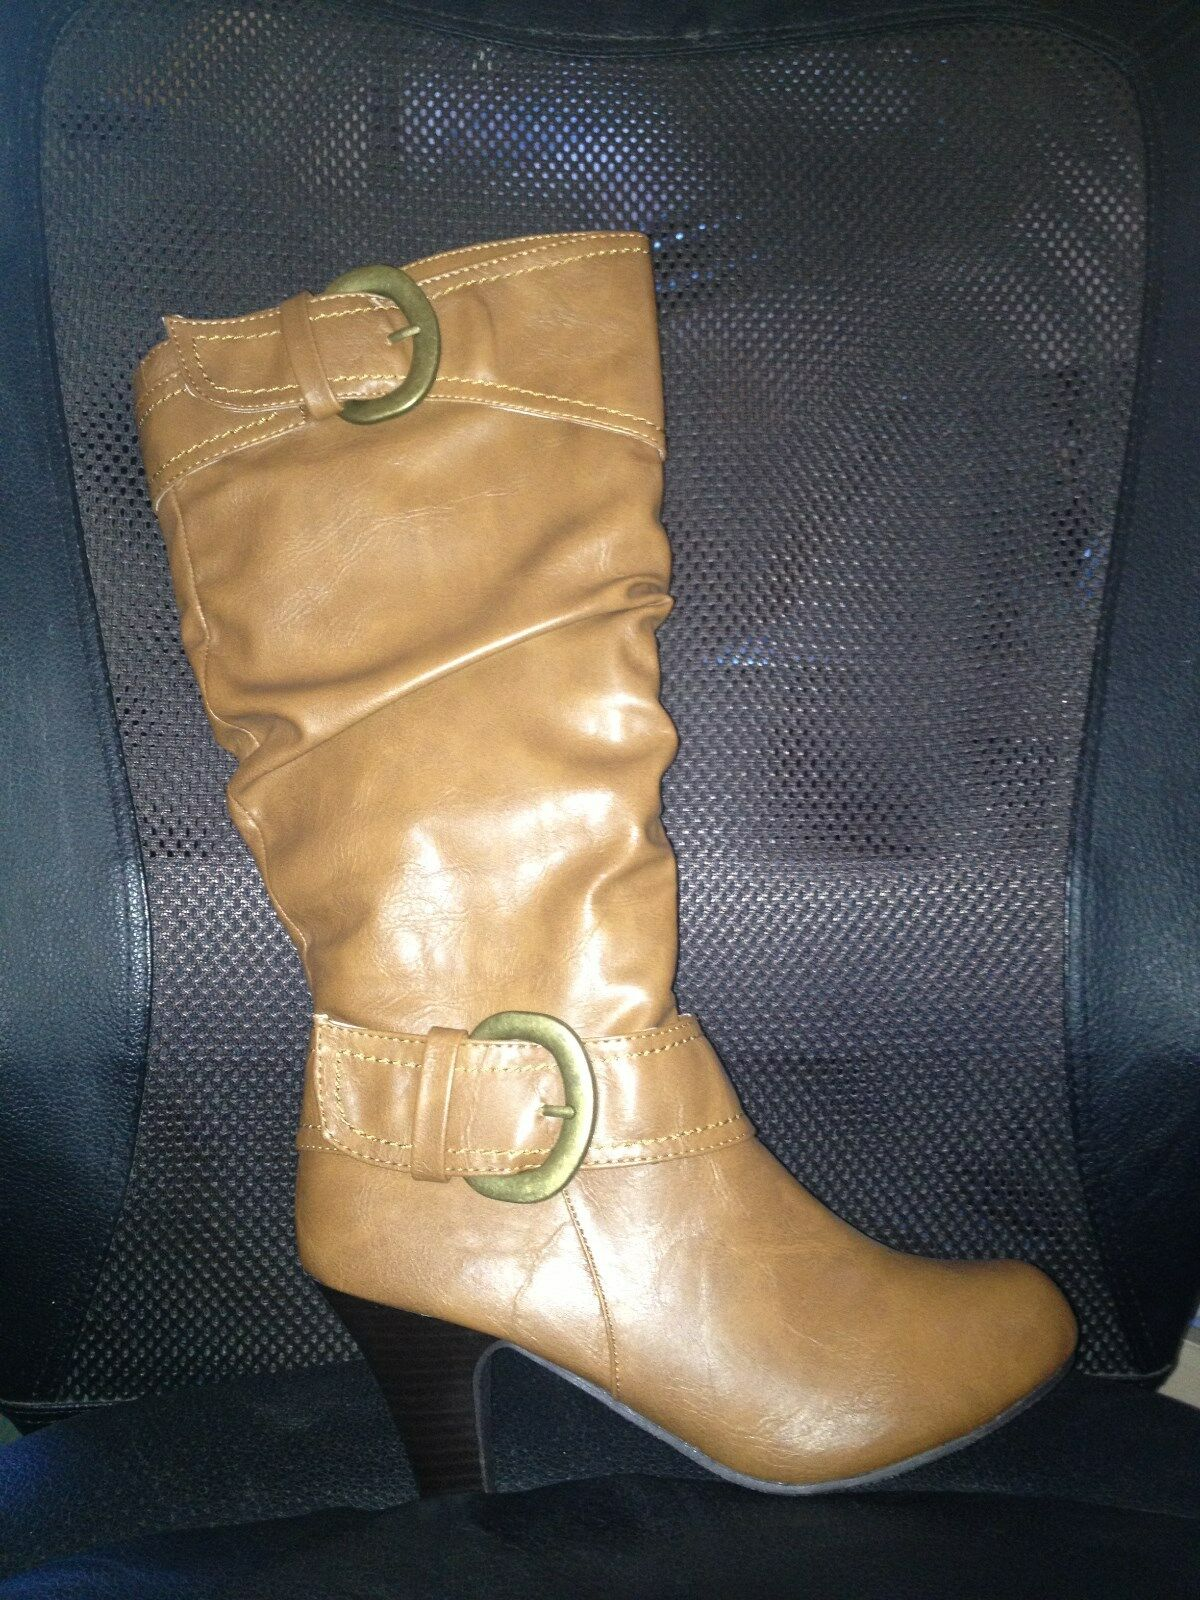 NIB Madden Girl Cognac Stiefel 7